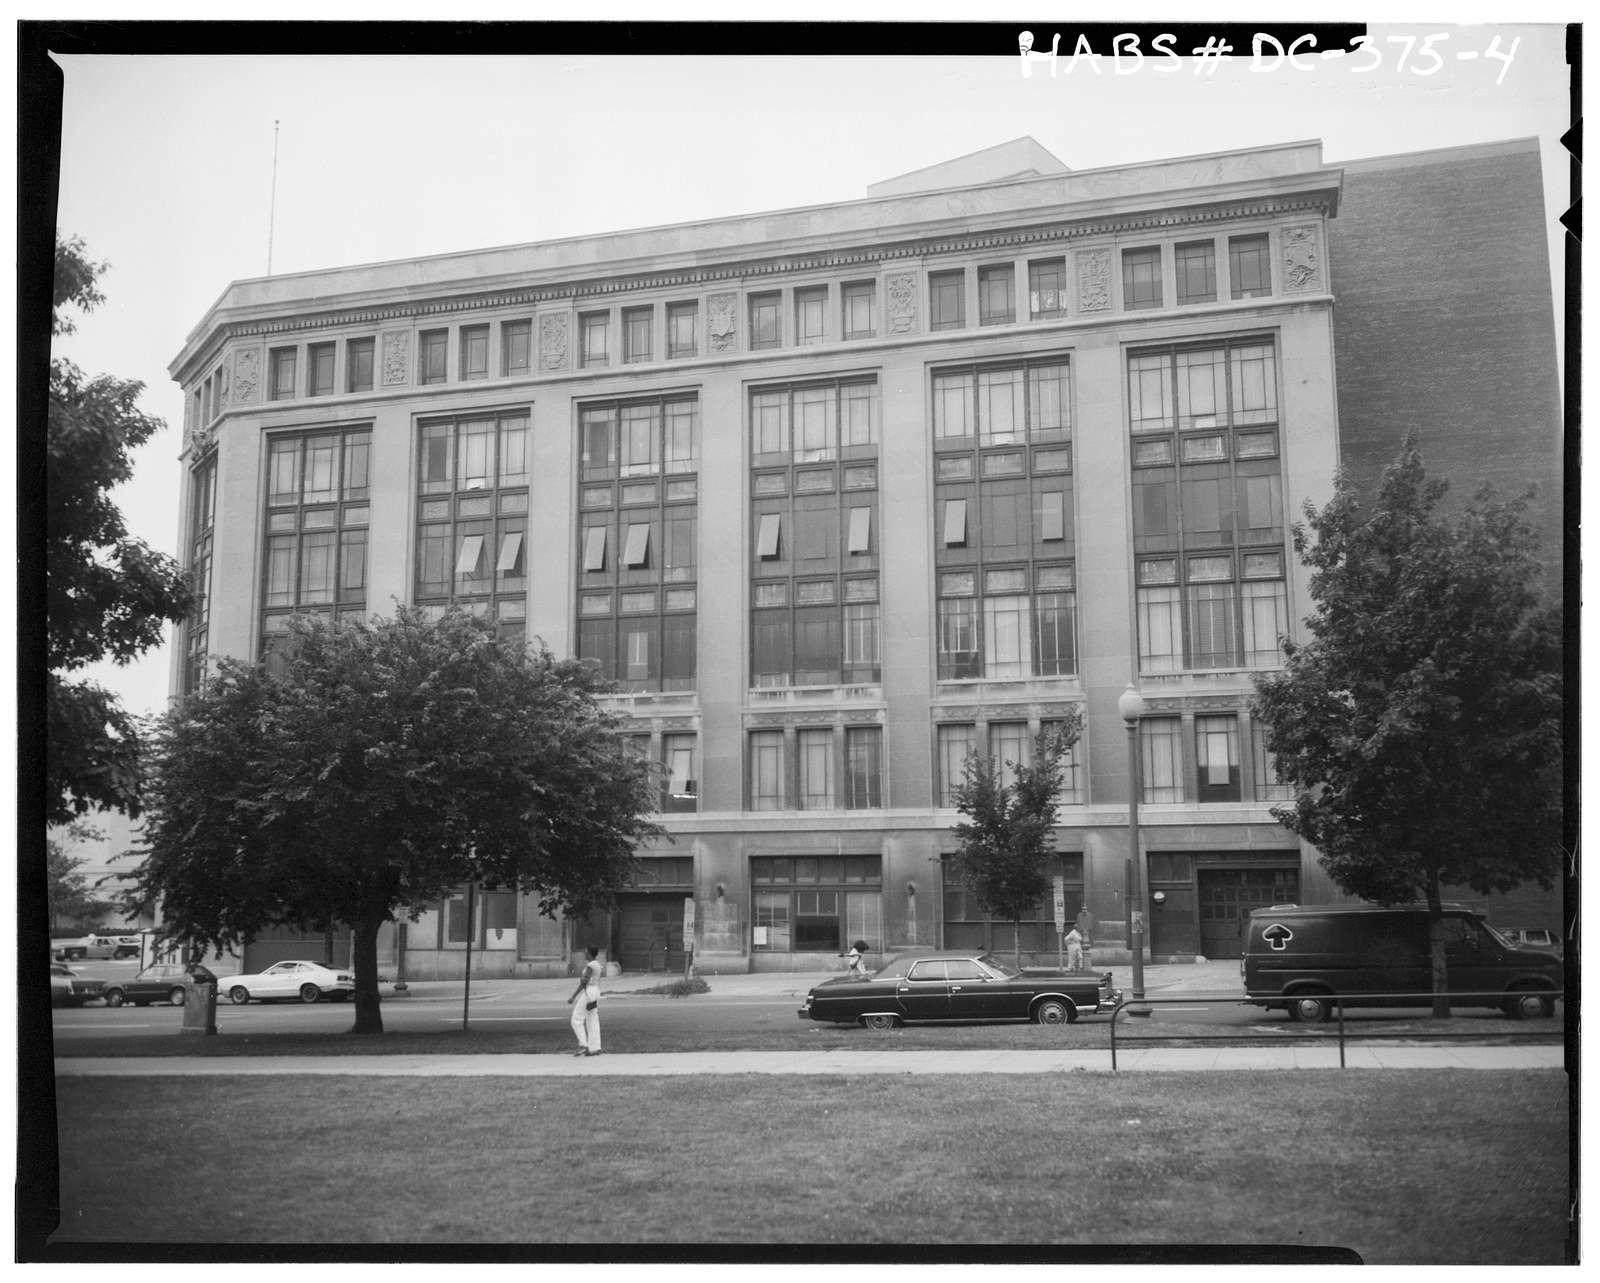 Ford Motor Company Building, 451-455 Pennsylvania Avenue Northwest, Washington, District of Columbia, DC